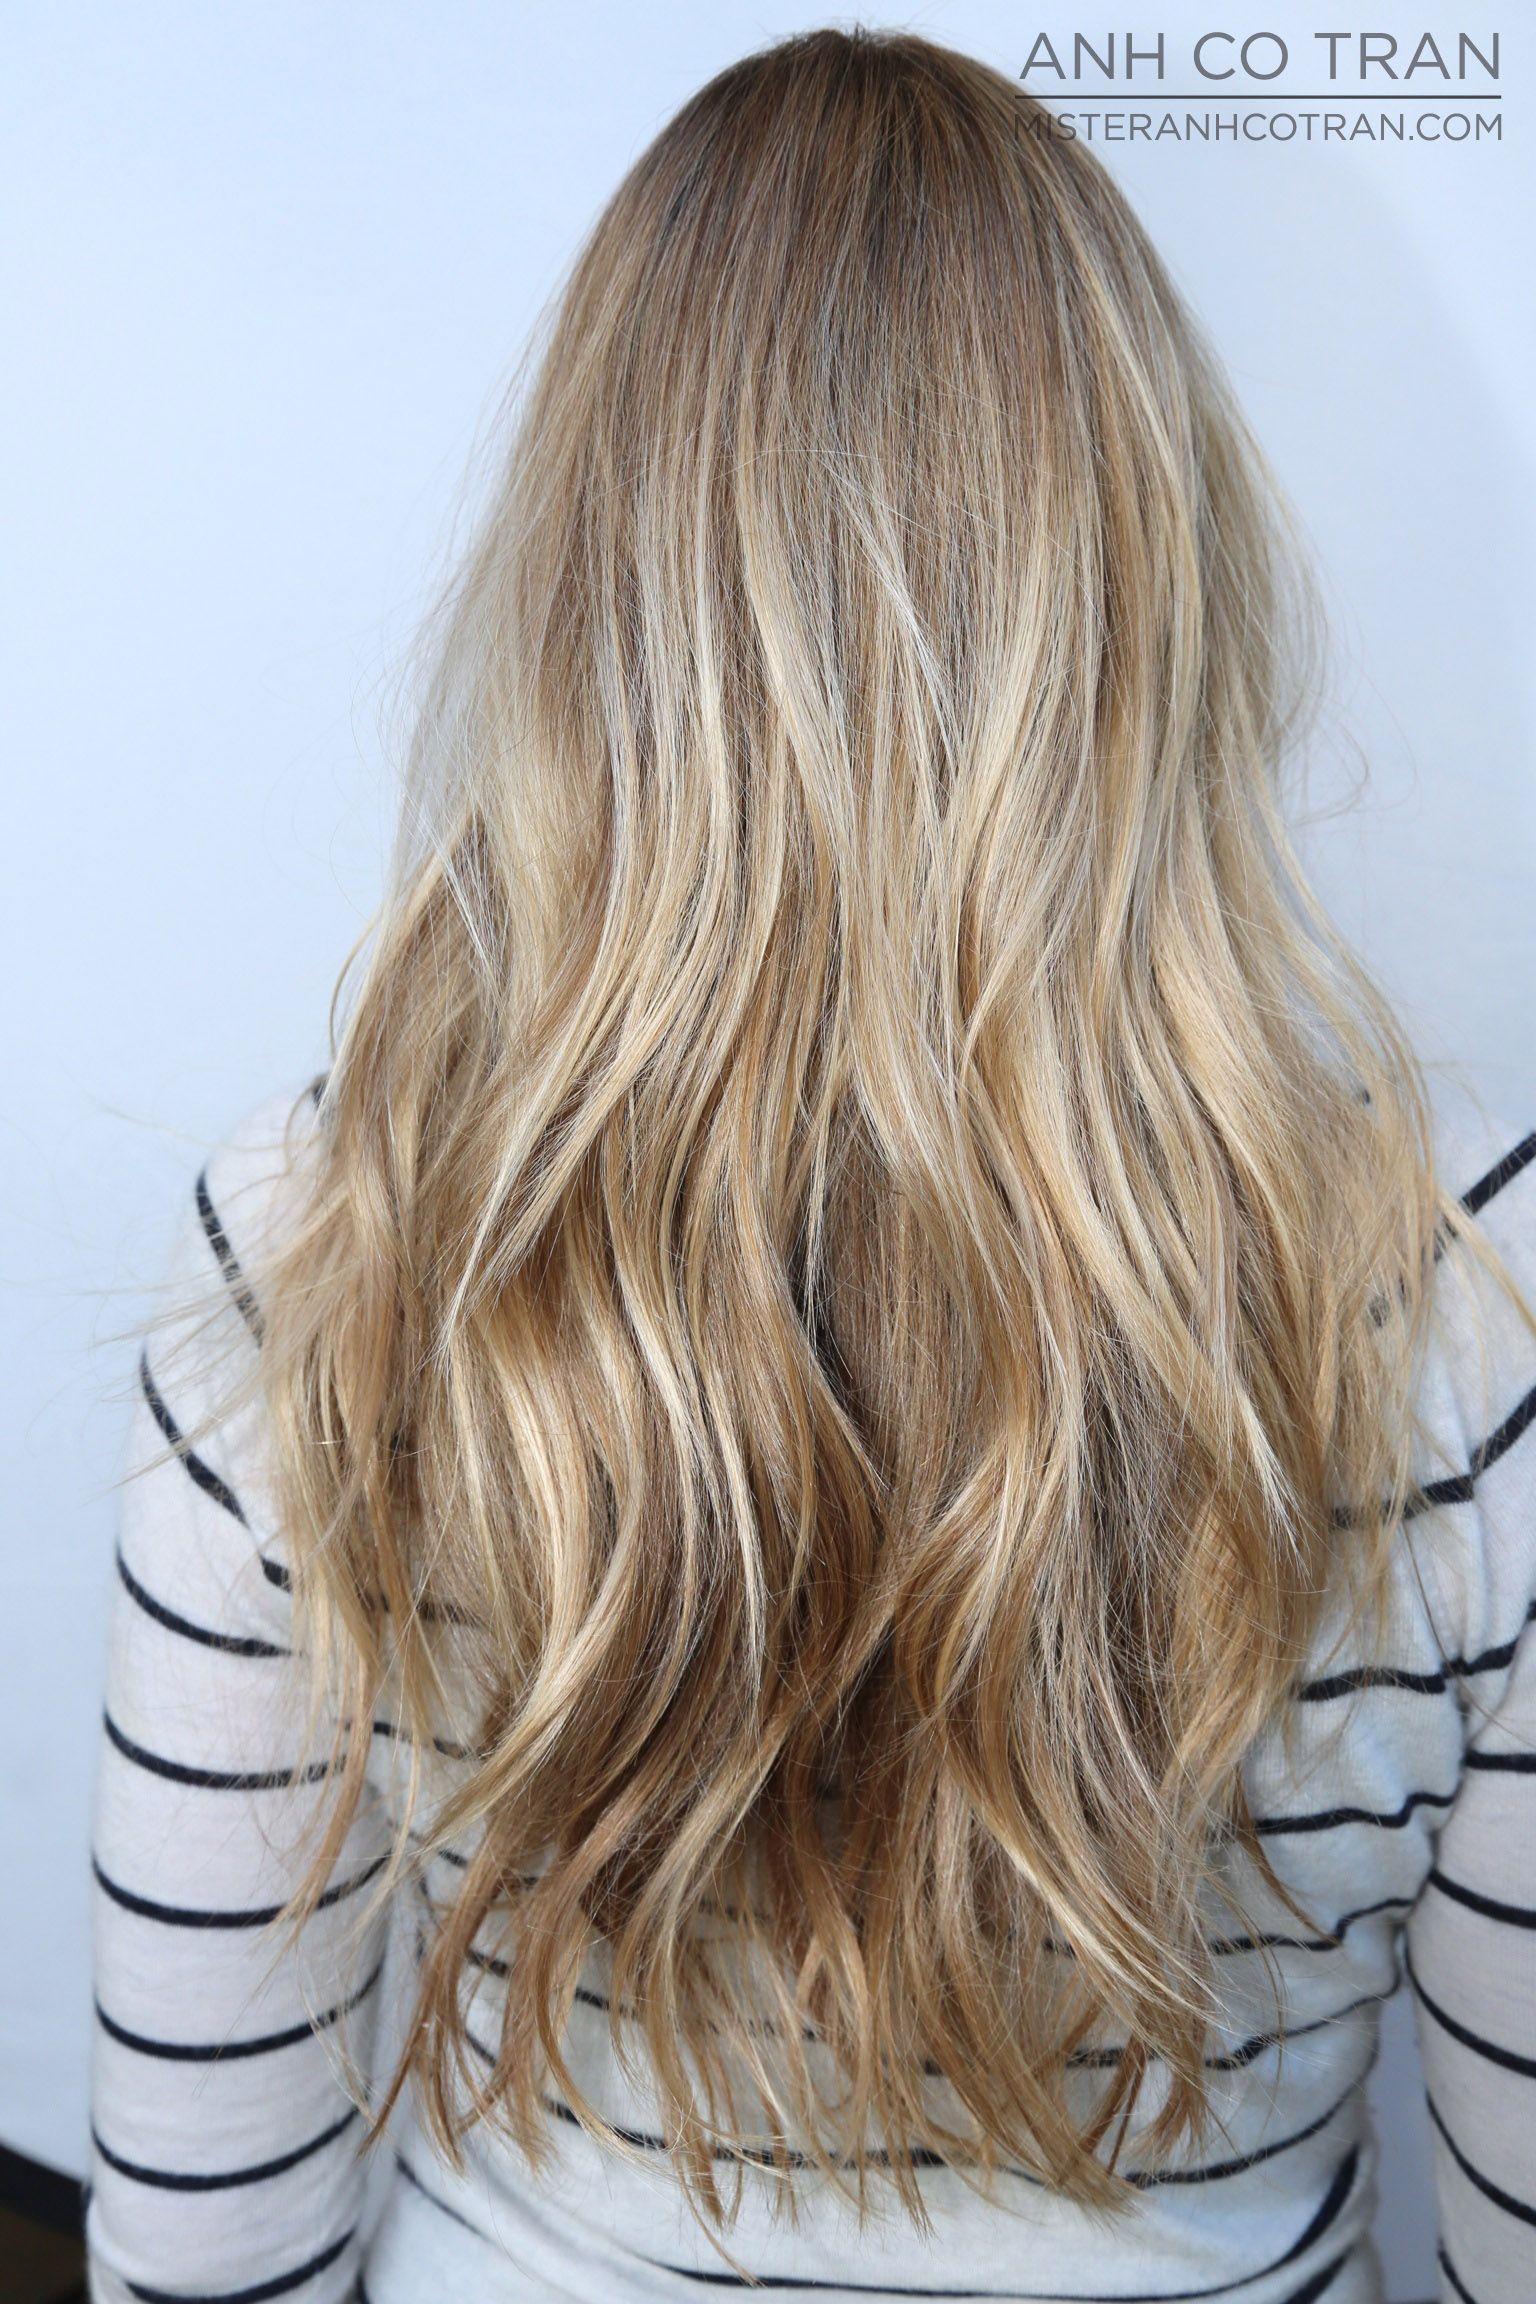 Misteranhcotran hair pinterest hair coloring hair style